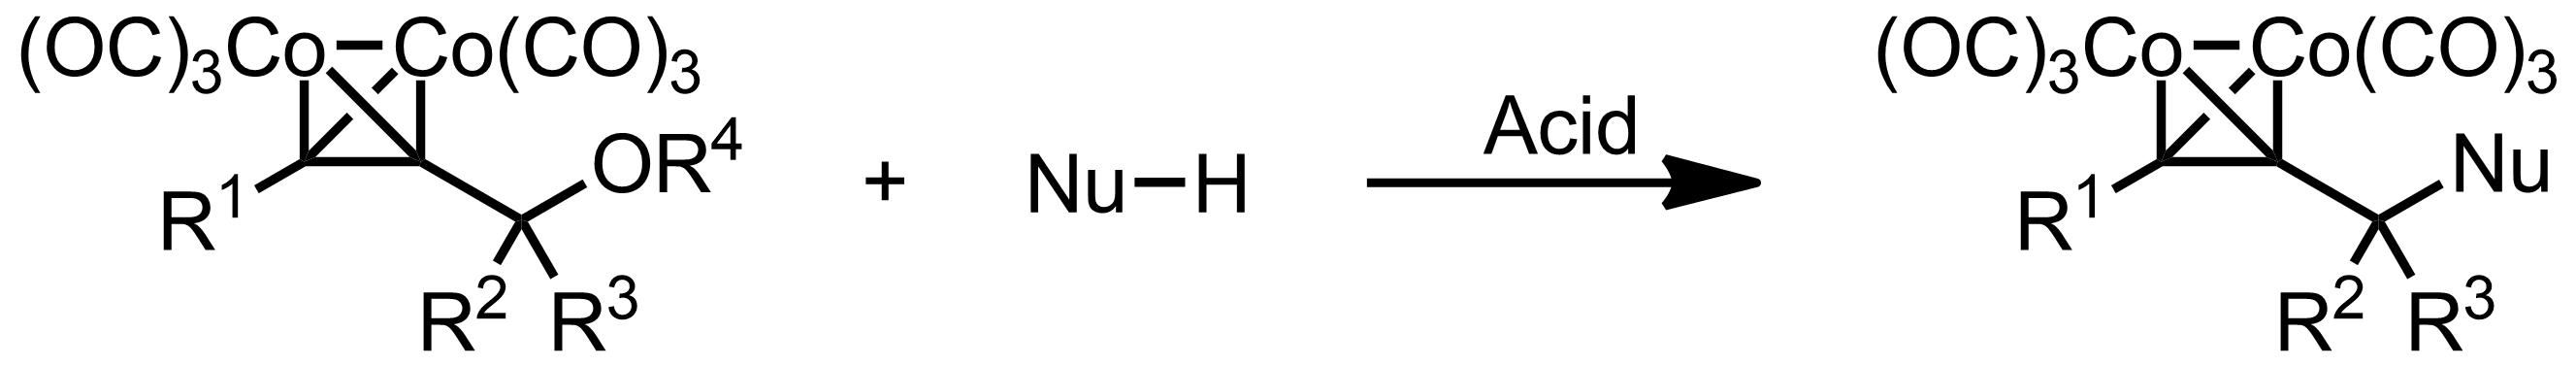 Schematic representation of the Nicholas Reaction.